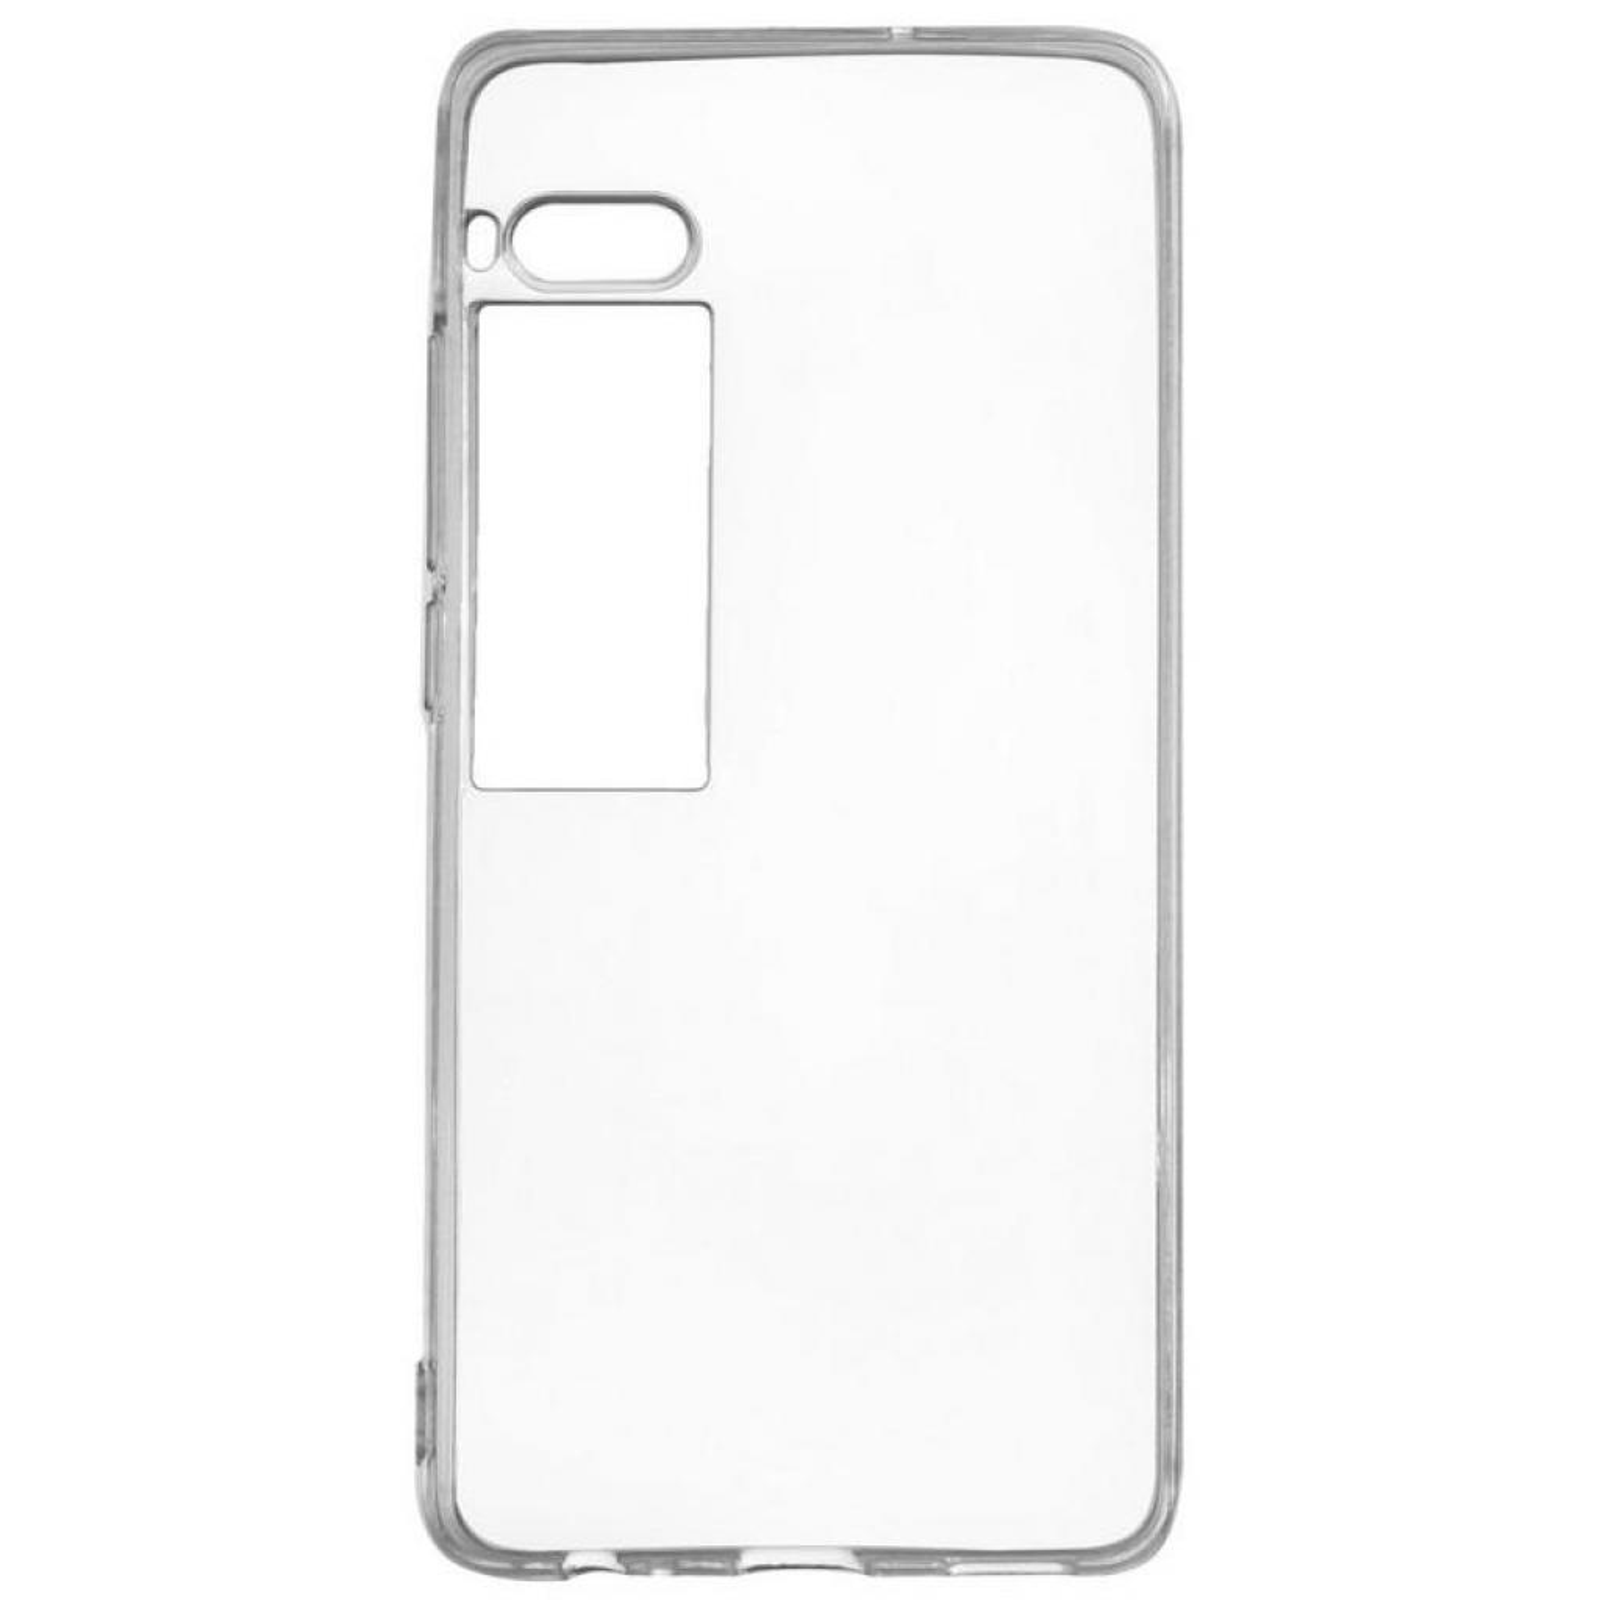 Чехол для моб. телефона Colorway ultrathin TPU case for Meizu Pro 7 (CW-CTPMP7)